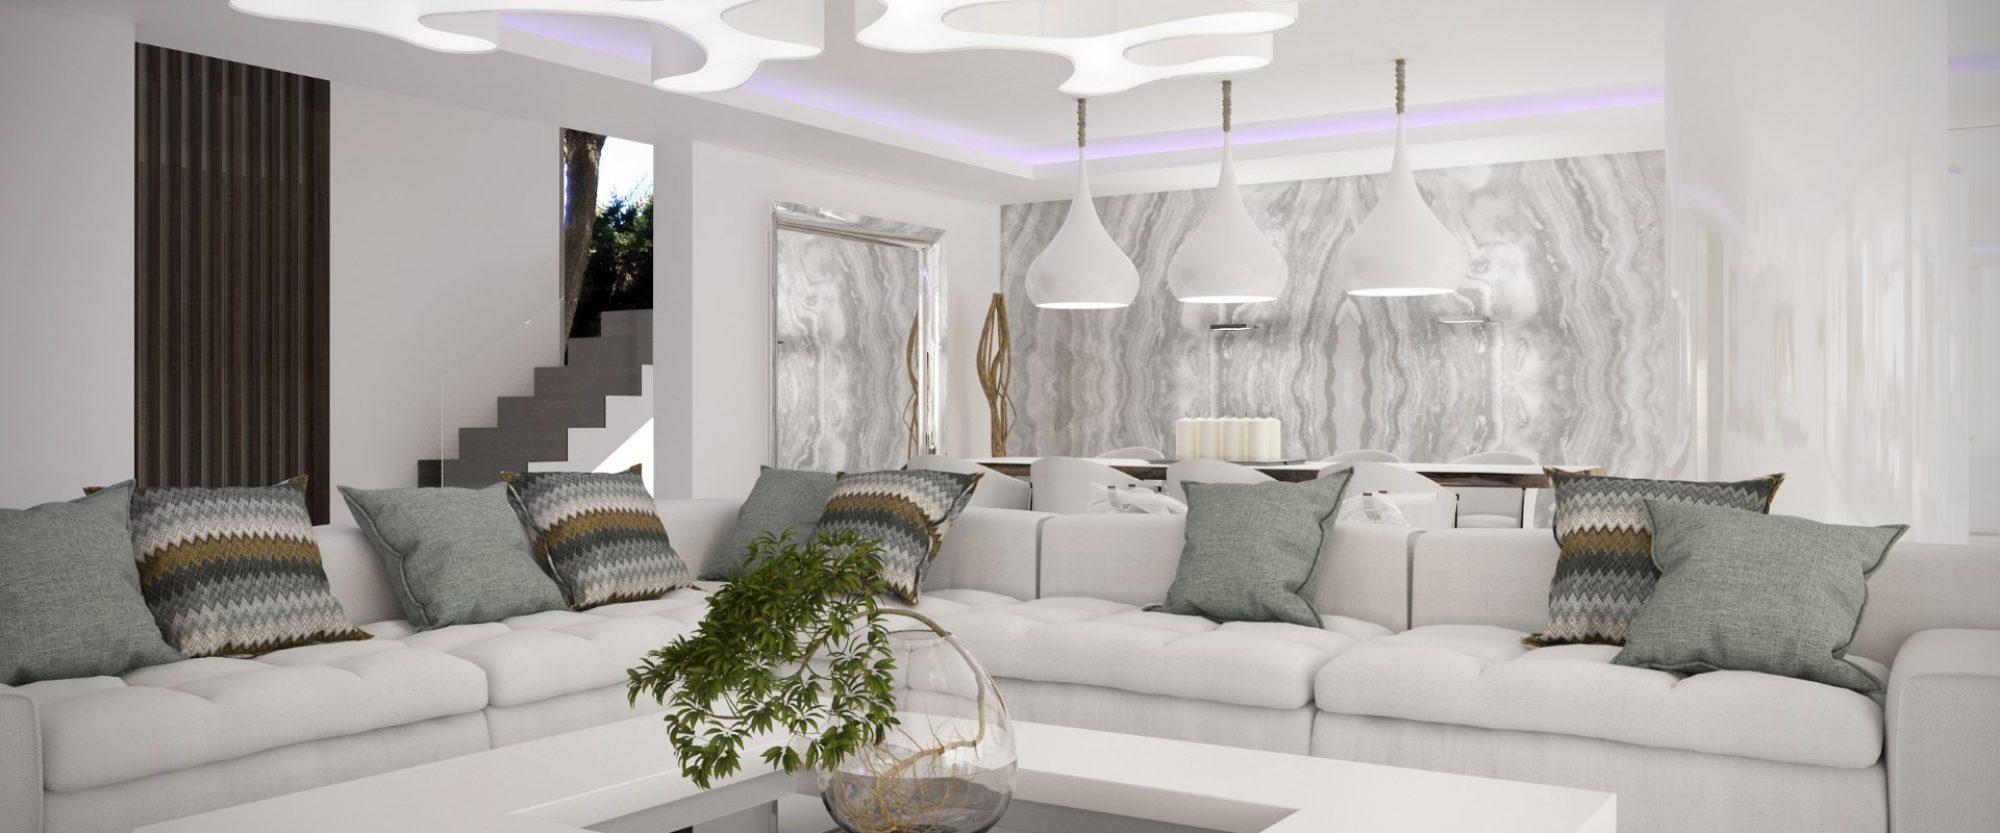 contemporary villa for sale in marbella large reception room